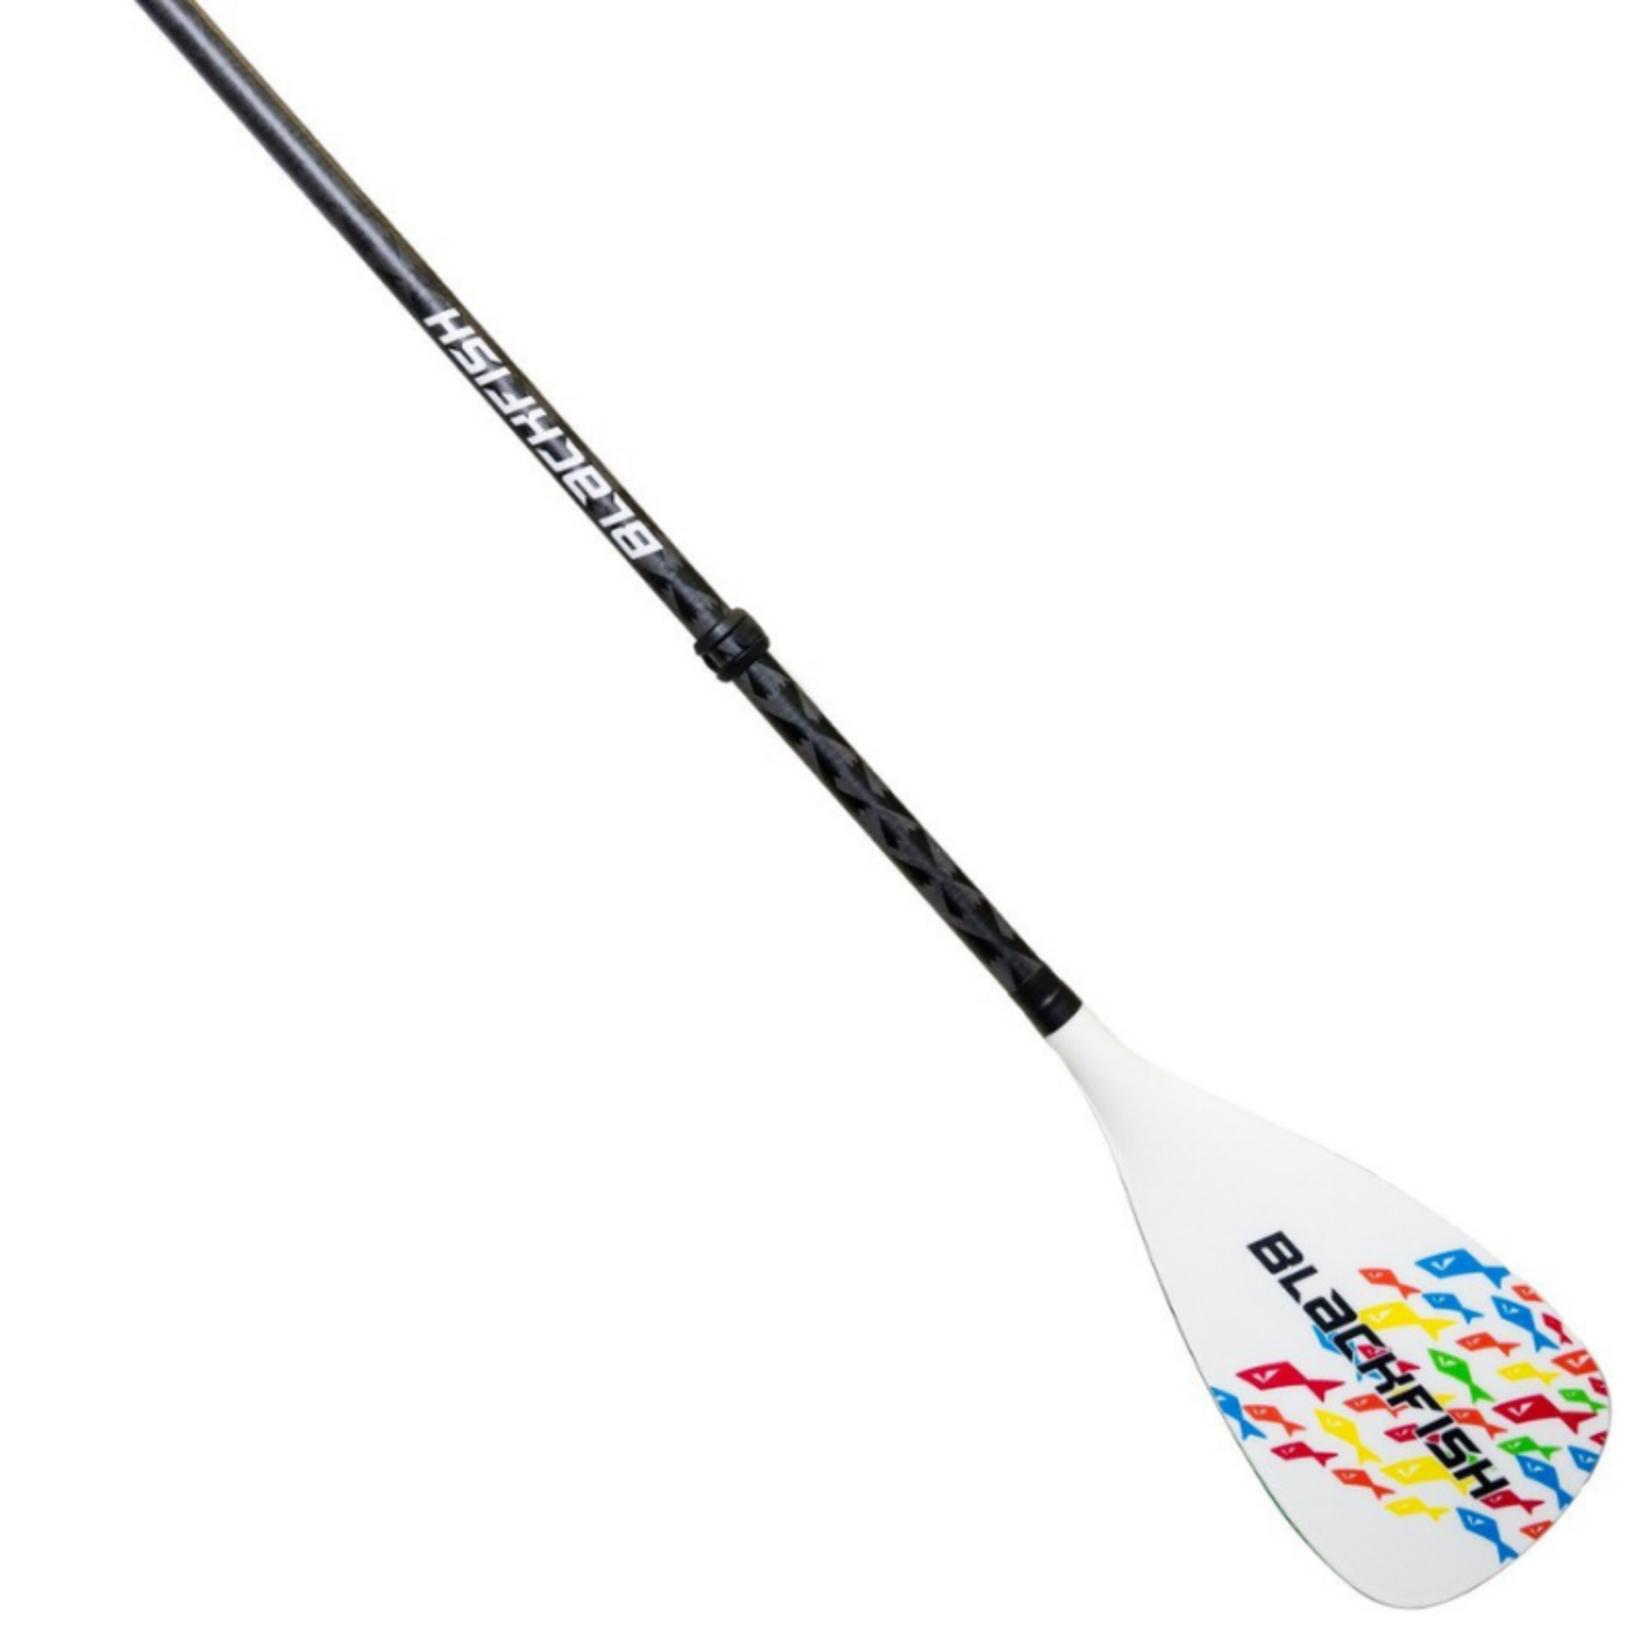 Blackfish Paddles Blackfish Nootka 520 Fishskin Adjustable 3 pc. SUP Paddle.